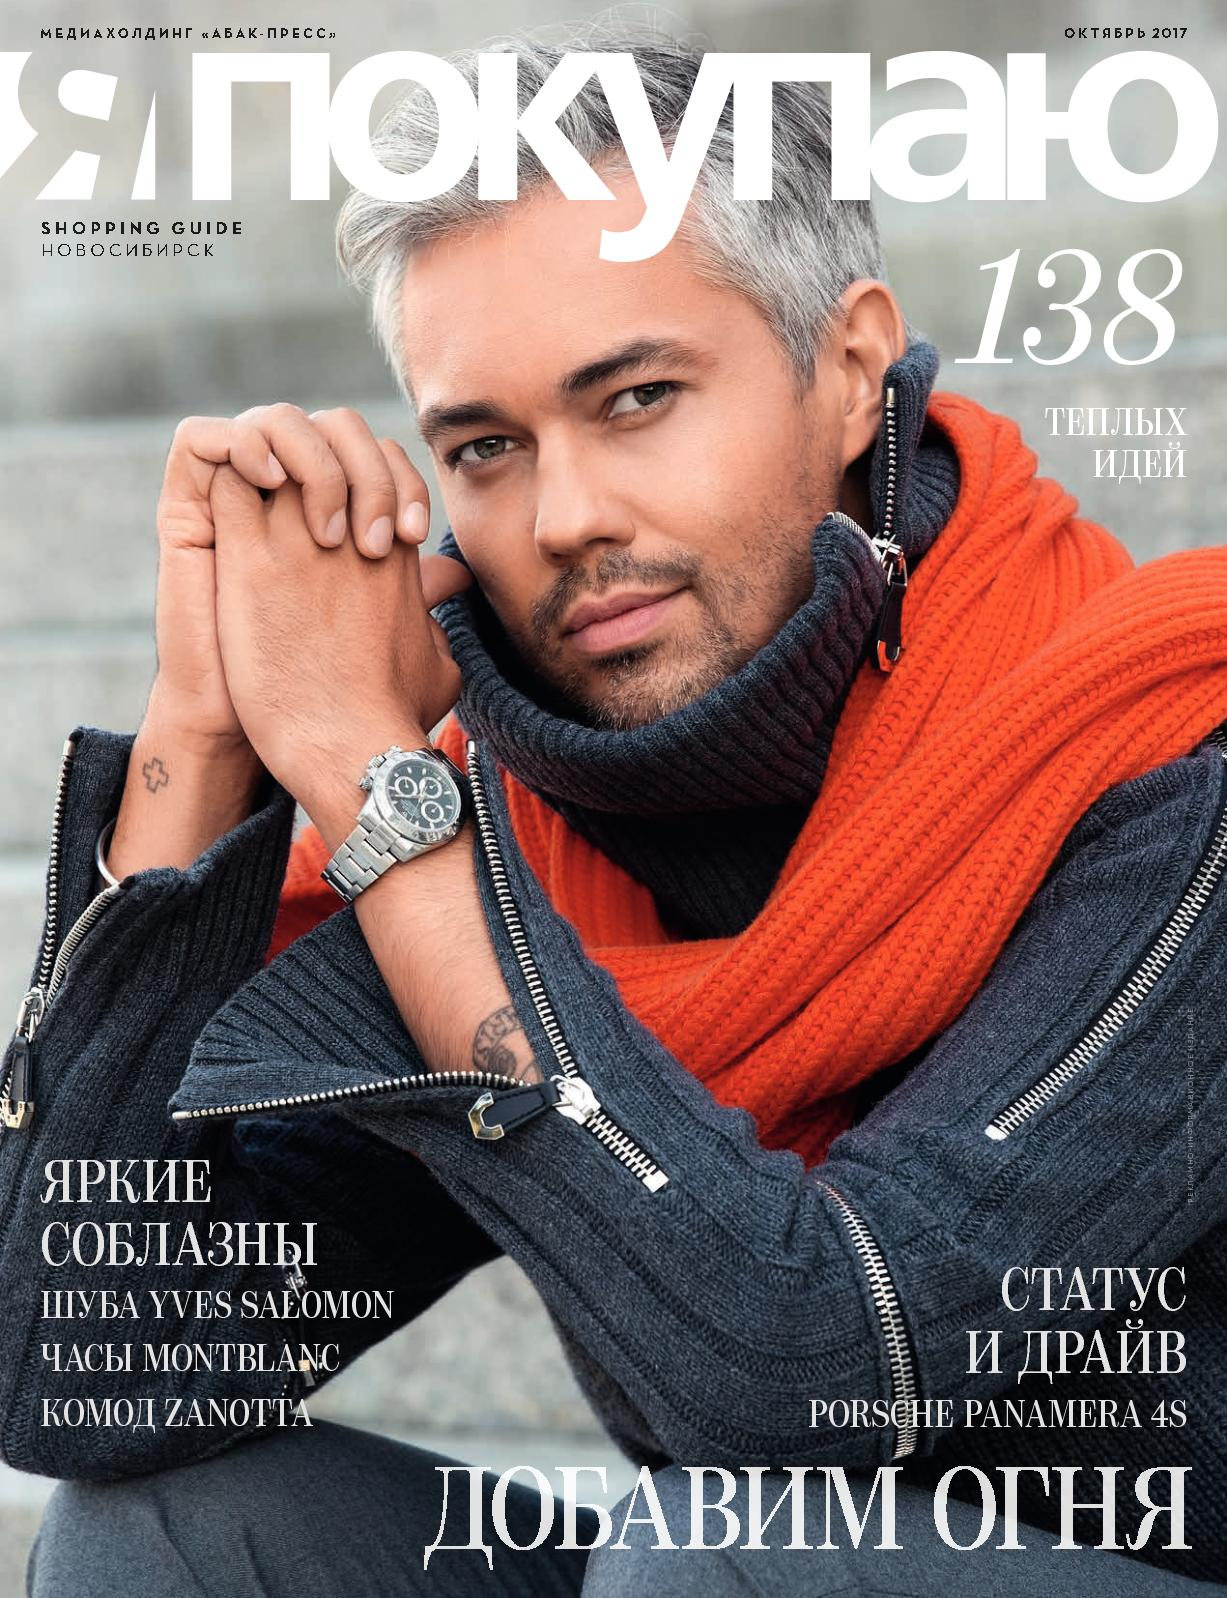 1e652636dd9 Calaméo - Журнал Shopping Guide «Я Покупаю» Новосибирск Октябрь 2017